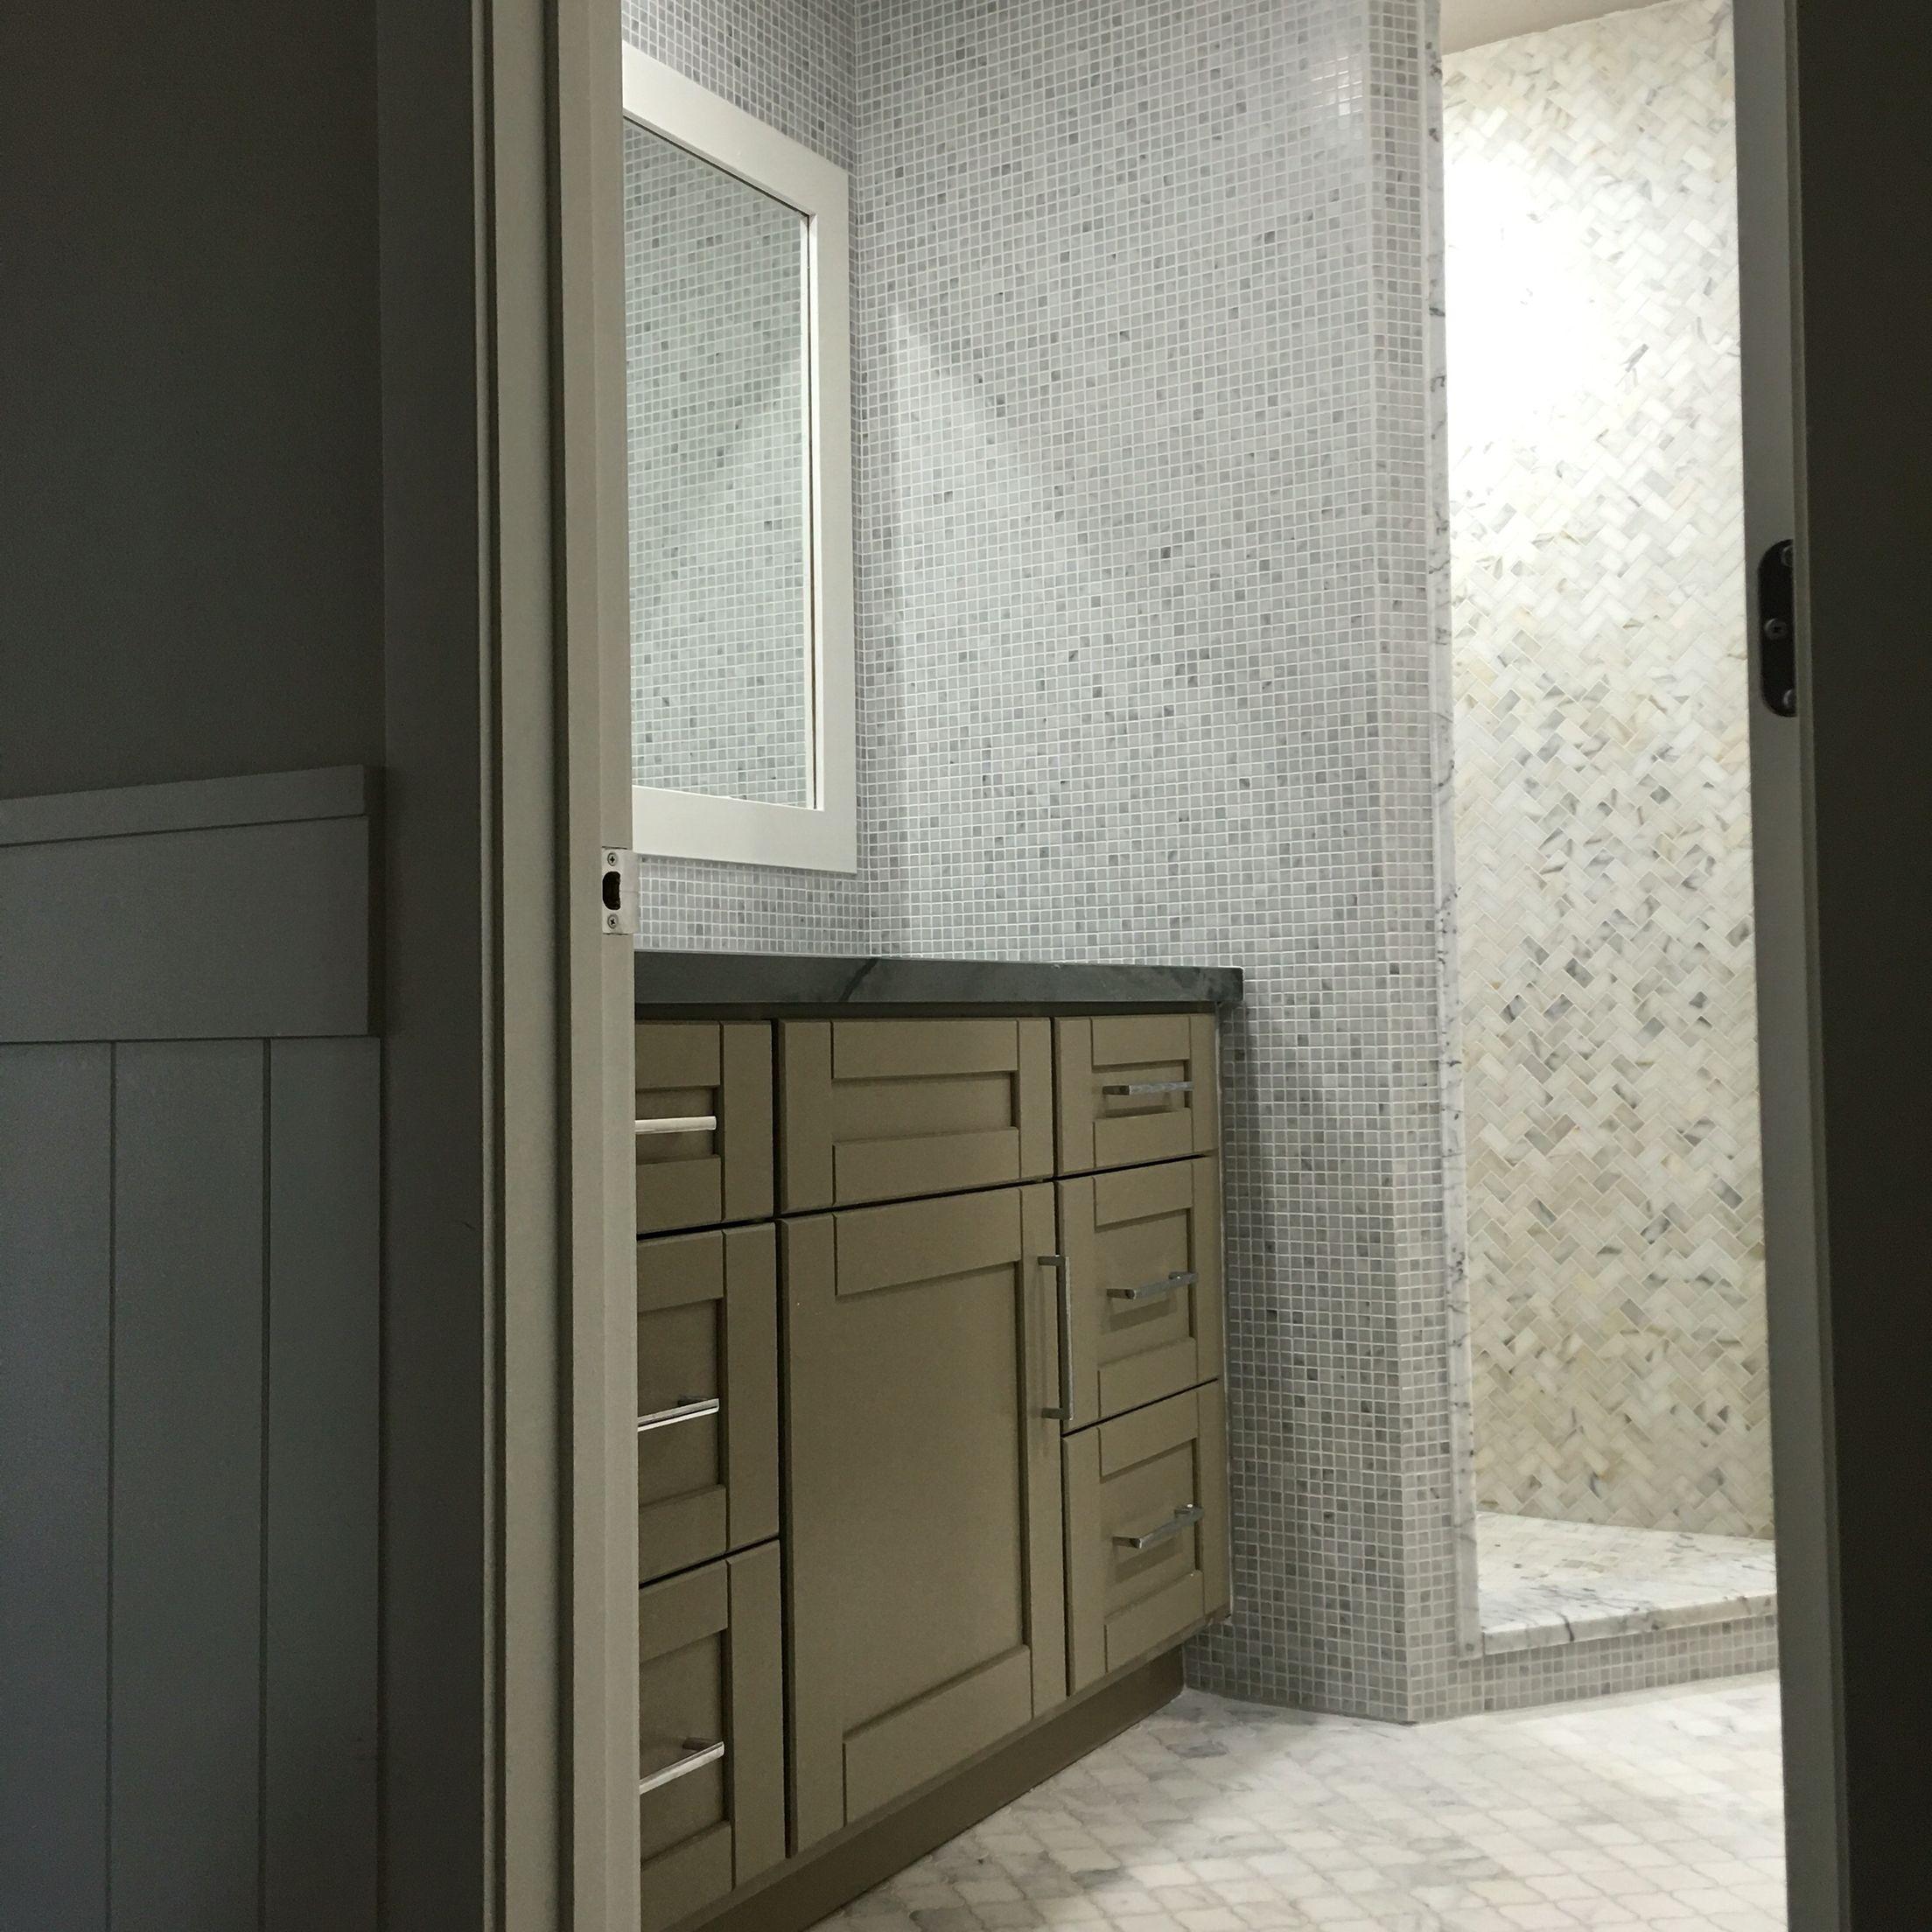 Carrara white marble arabesque mosaic floor tile heated by ditra carrara white marble arabesque mosaic floor tile heated by ditra heating system 1x2 calacatta dailygadgetfo Images